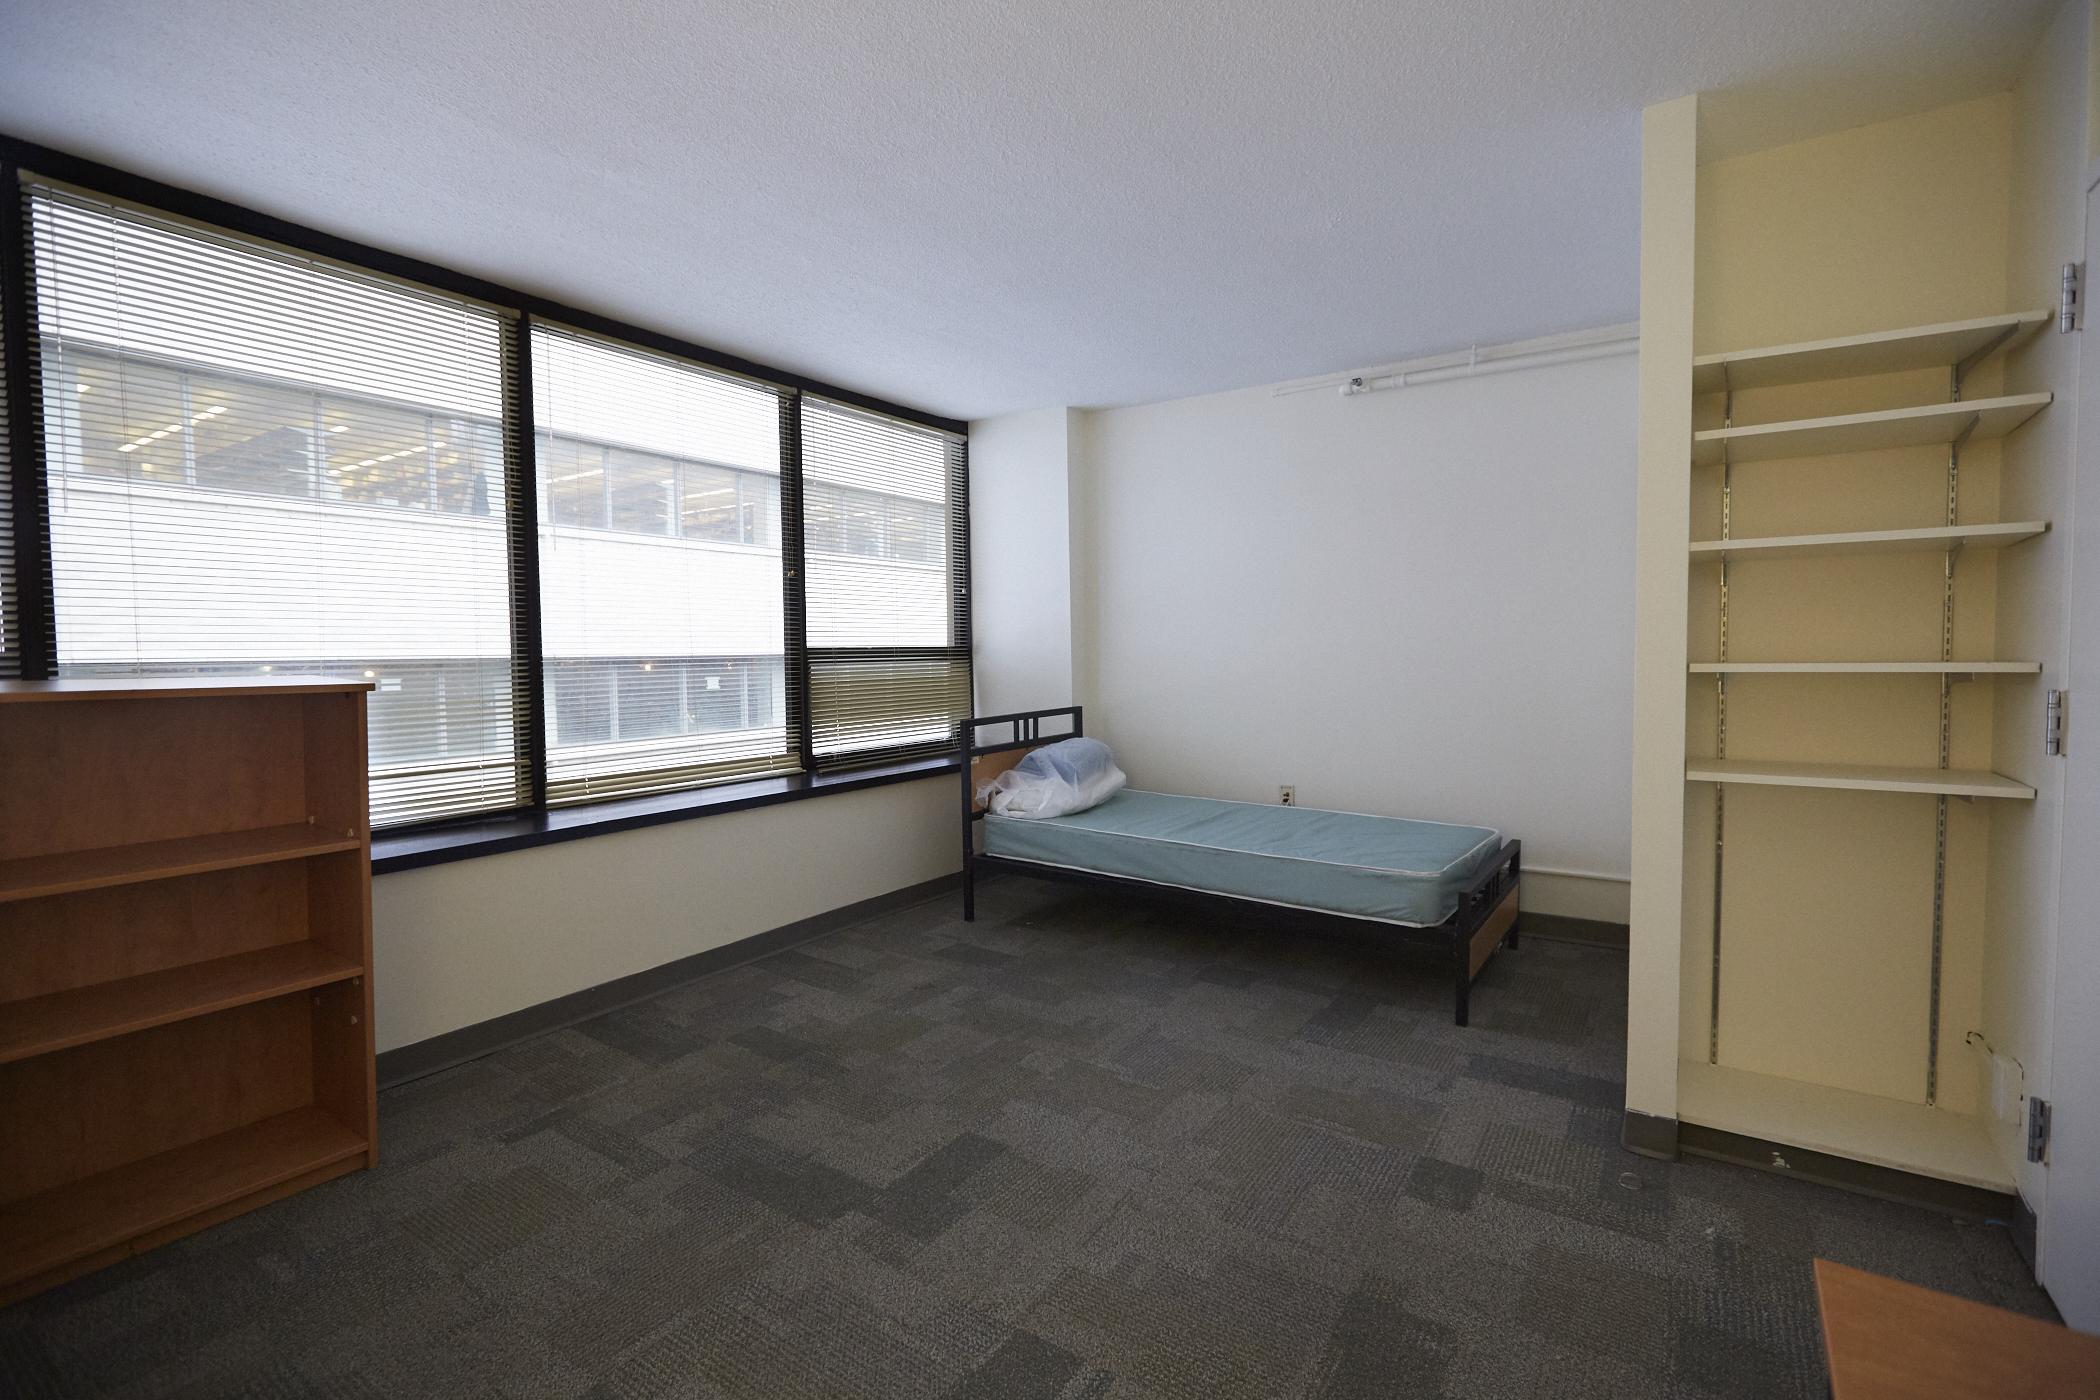 Housing Graduate School Of Medical Sciences